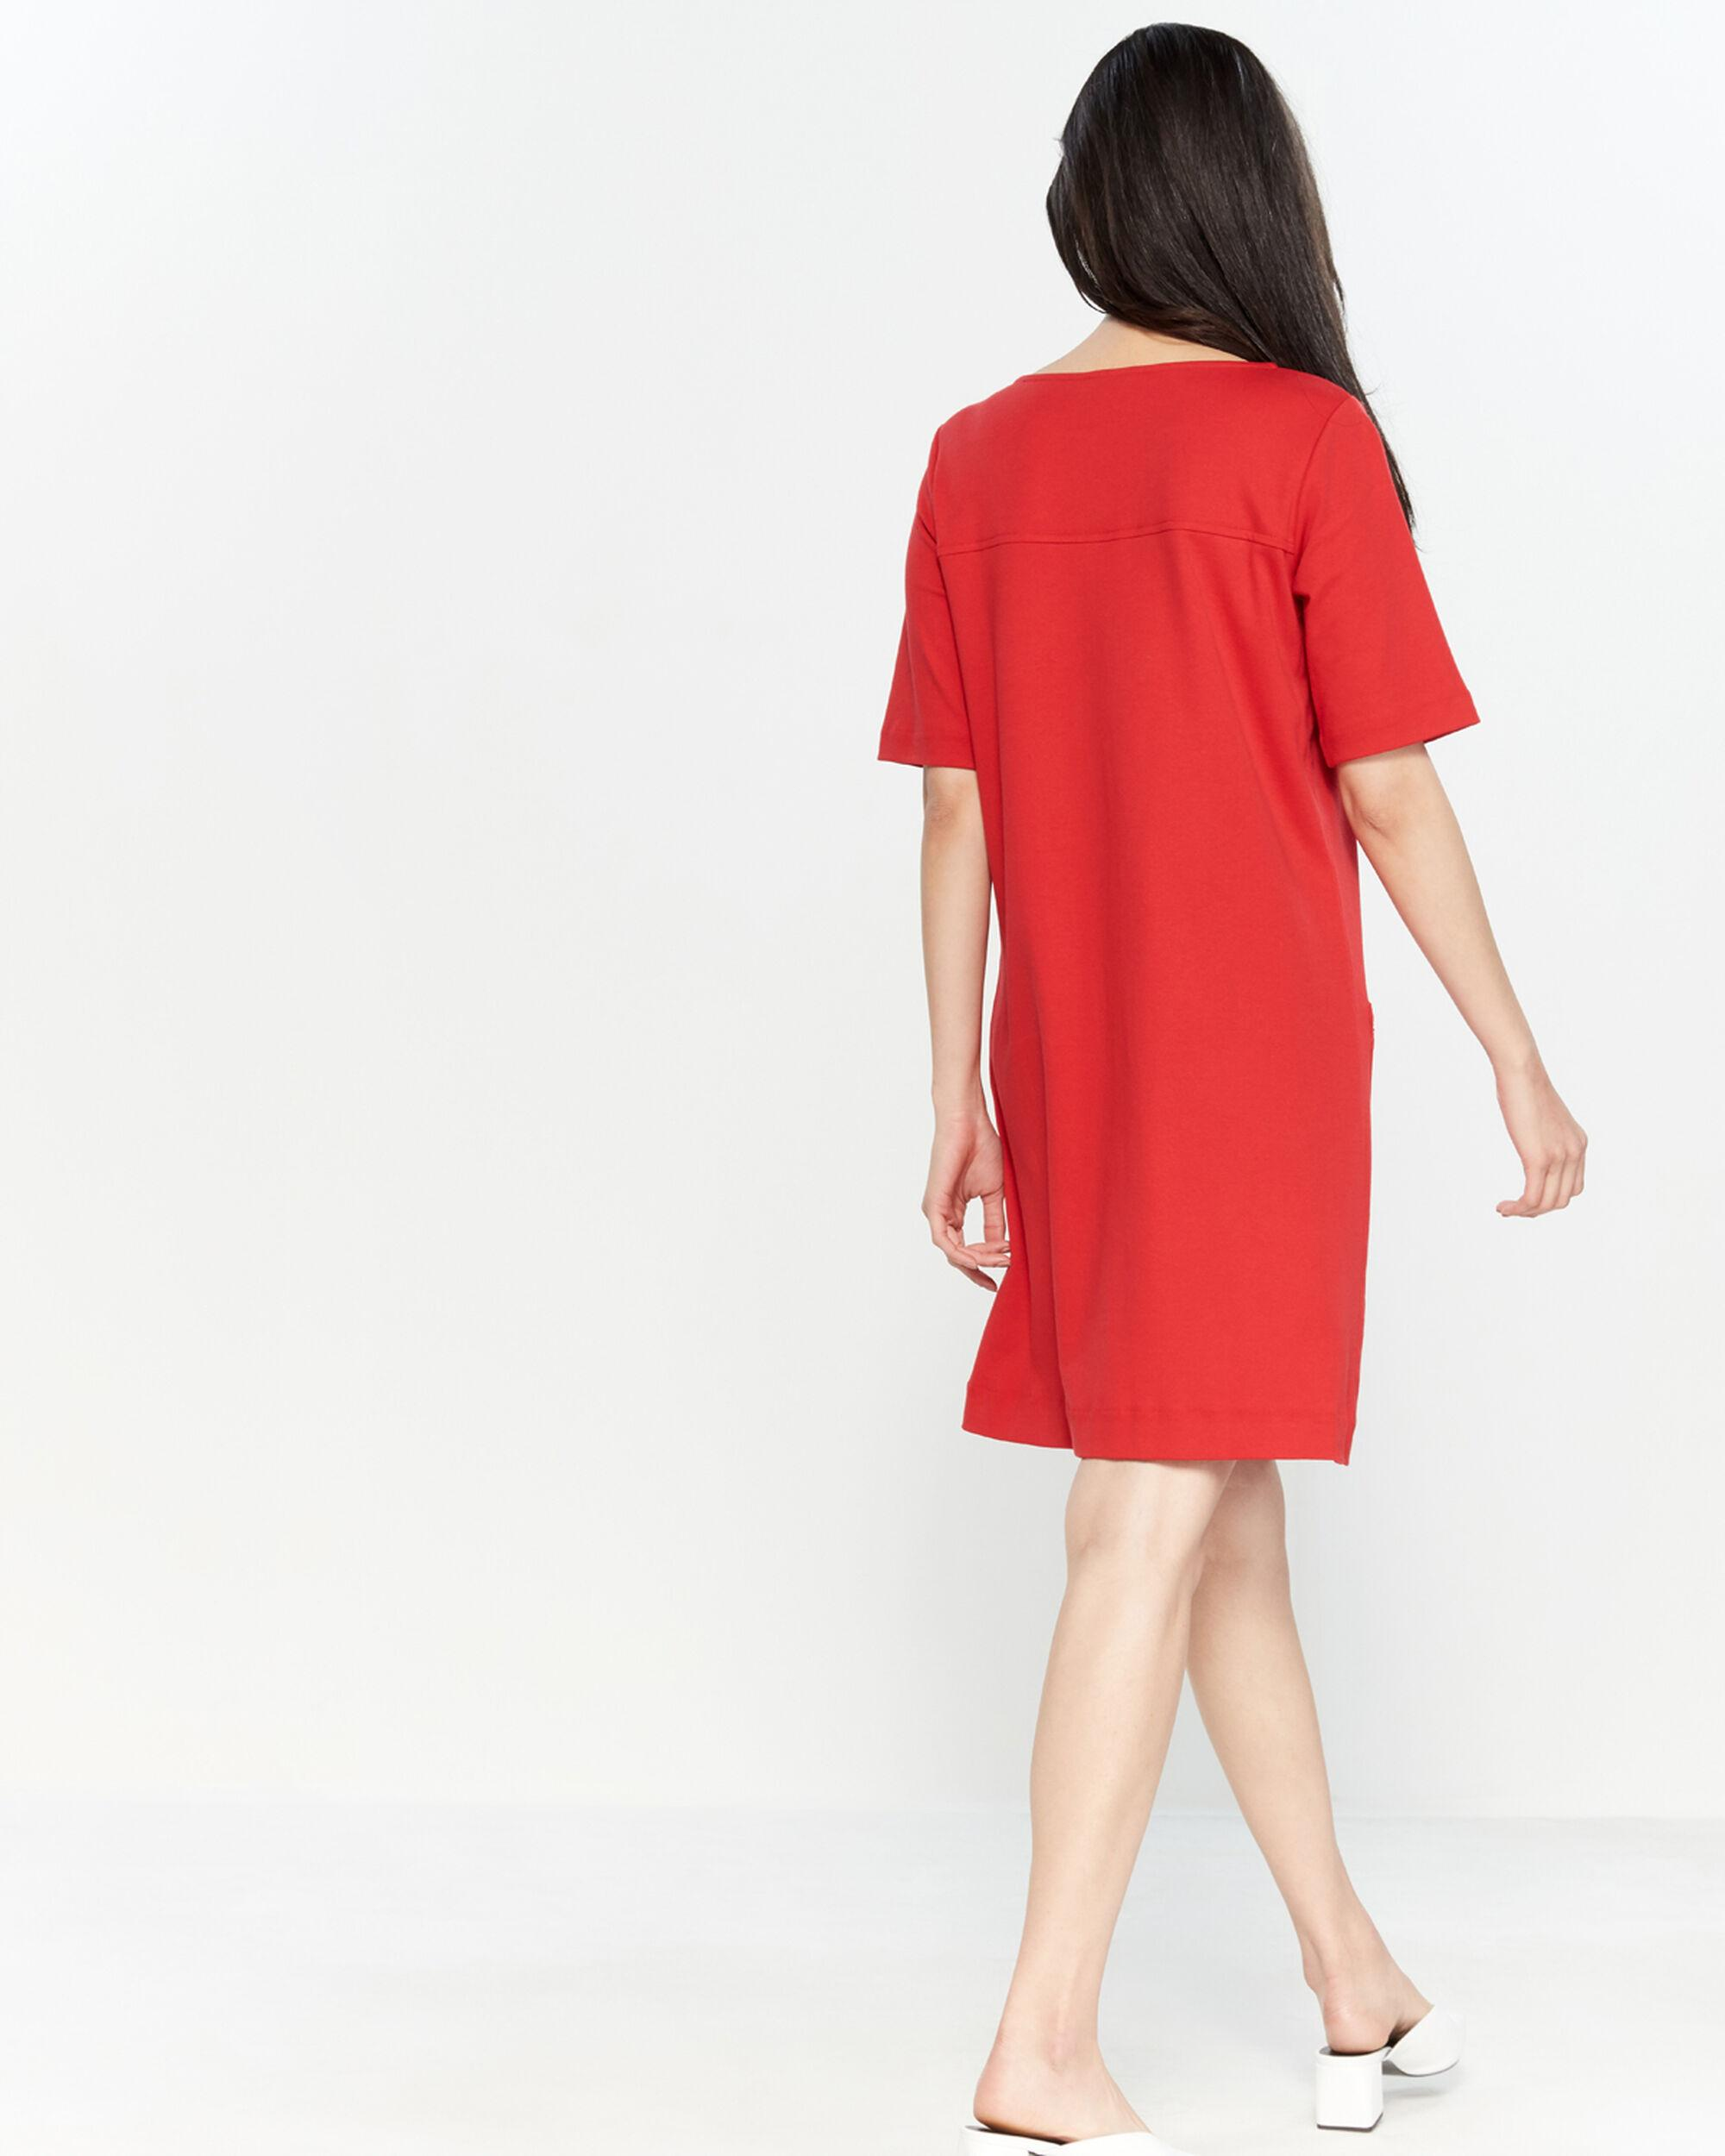 79bcbca3d Joan Vass Petite Zip Pocket Shift Dress in Red - Lyst